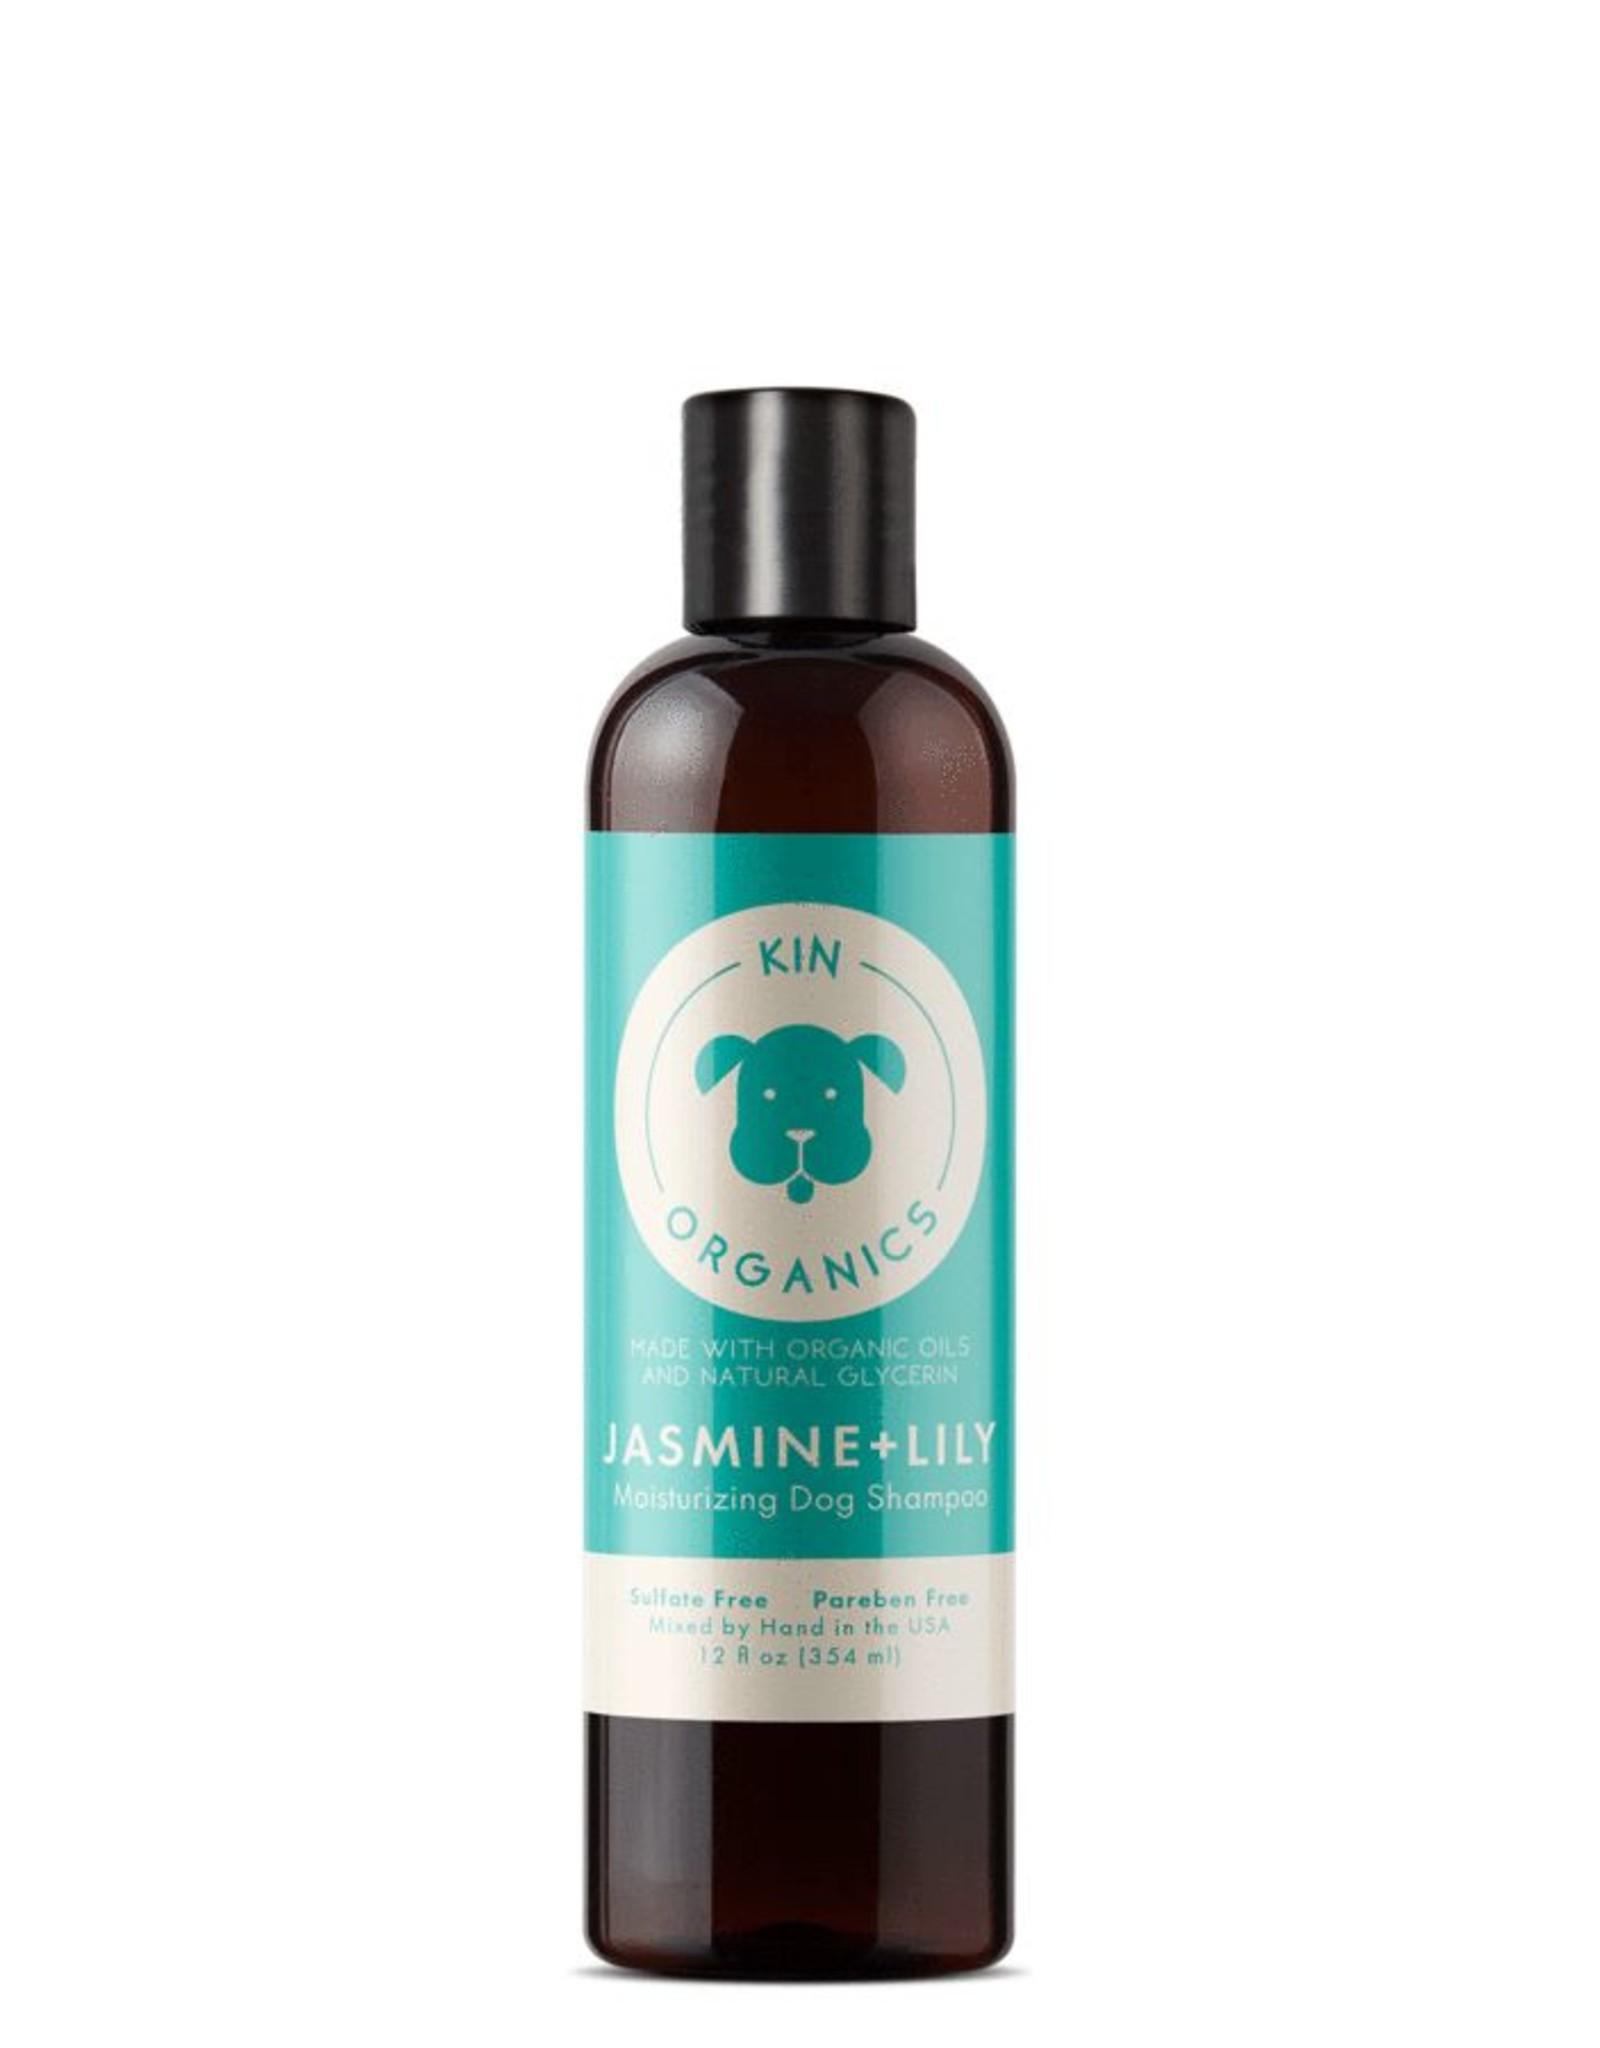 Kin+Kind Kin Organics Jasmine+Lily Dog Shampoo 12oz